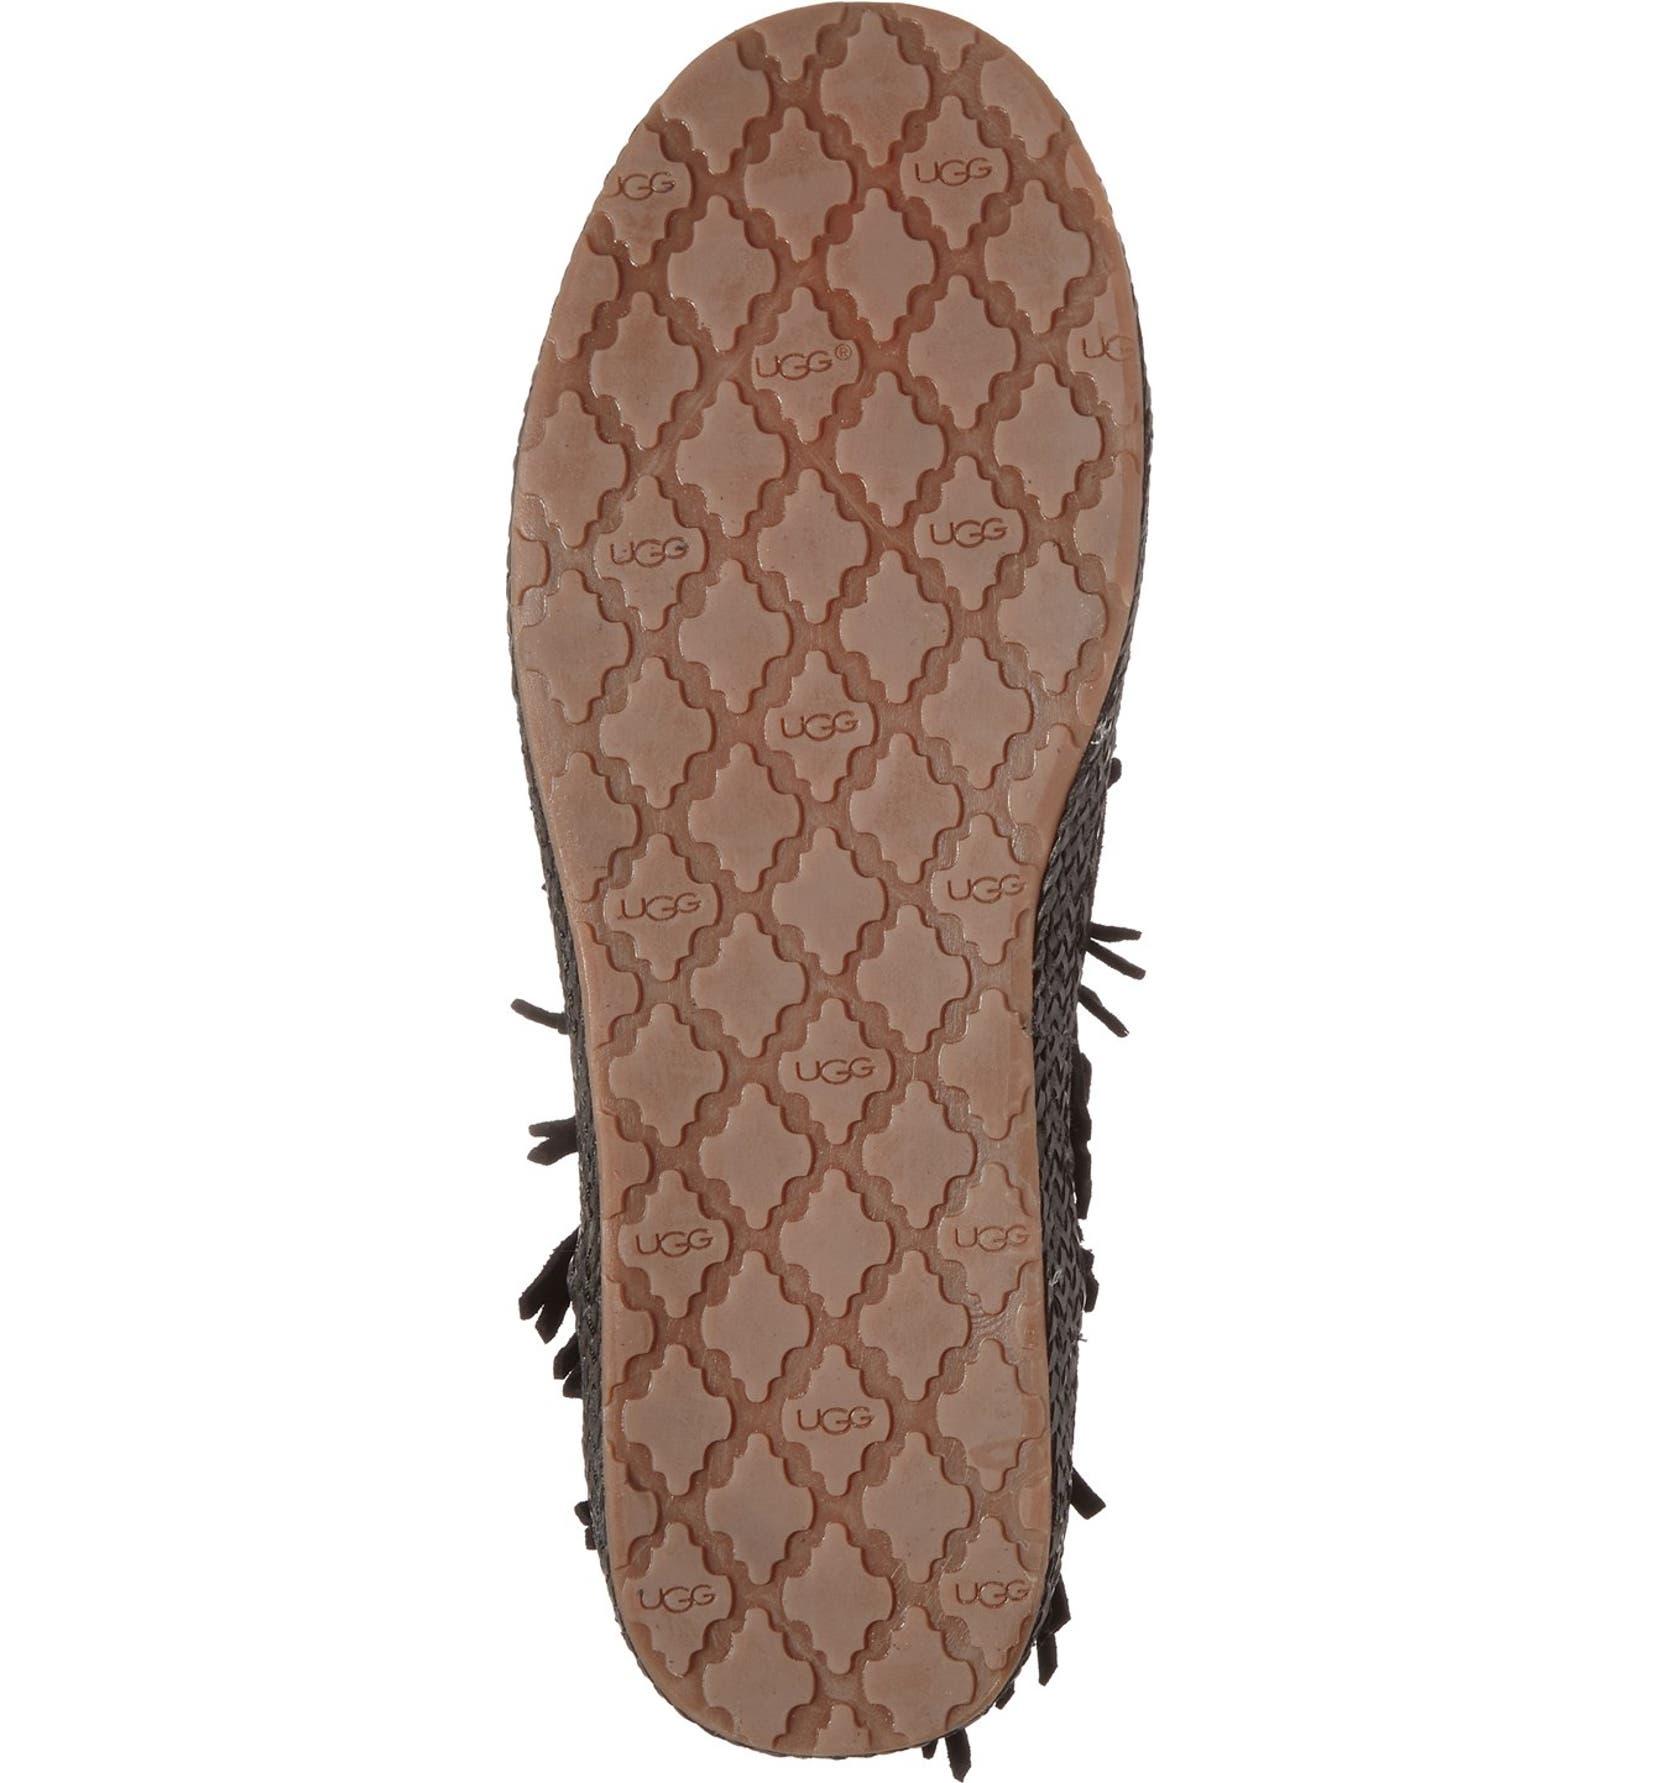 589ae8f9aa8 'Shenendoah' Fringe Ankle Boot